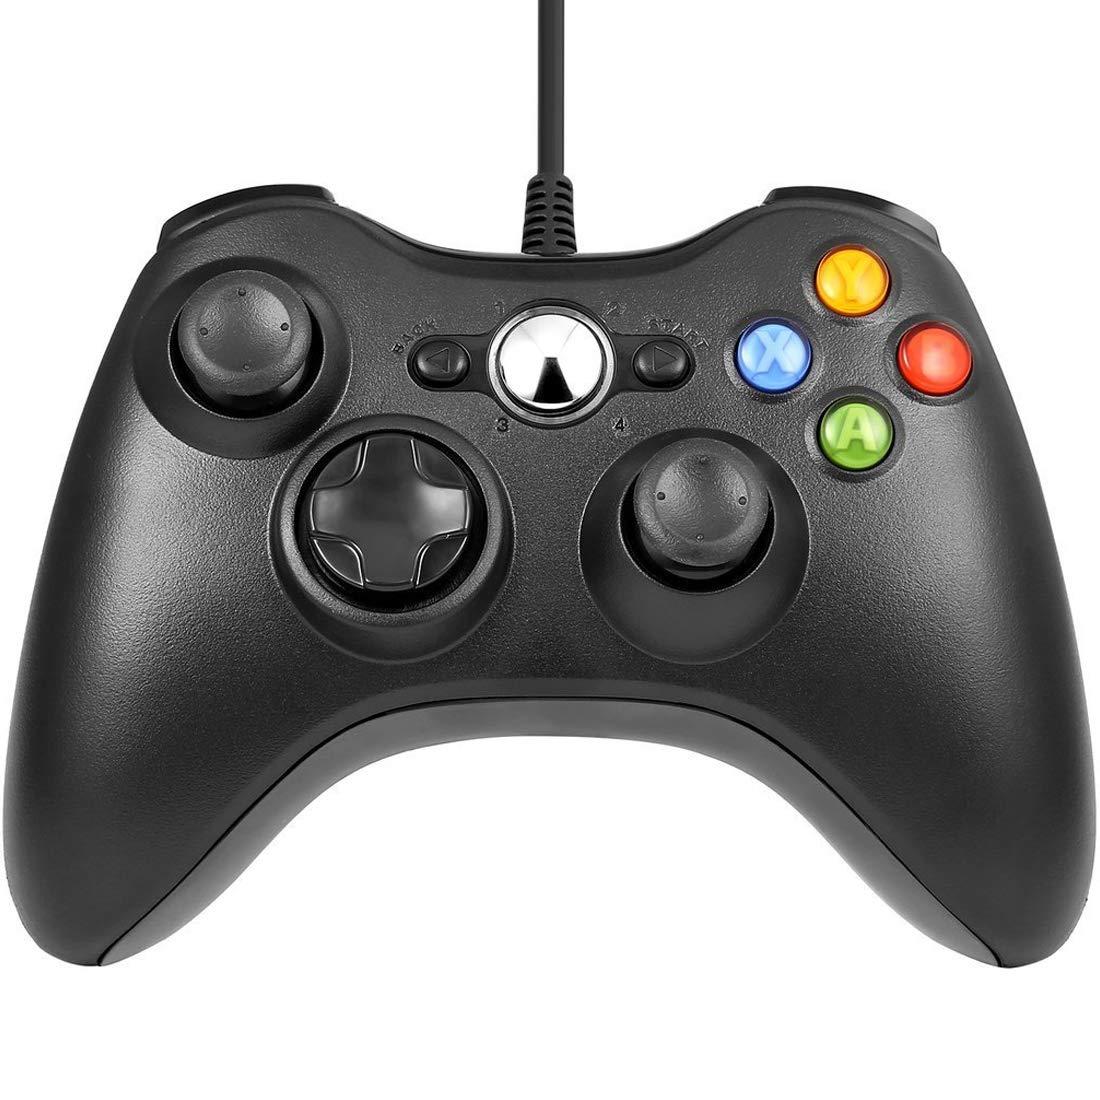 Schwarz Wired USB Game Pad Controller Gamepad Joystick fü r Microsoft Xbox 360 PC Schwarz NoyoKere LAIFC0357